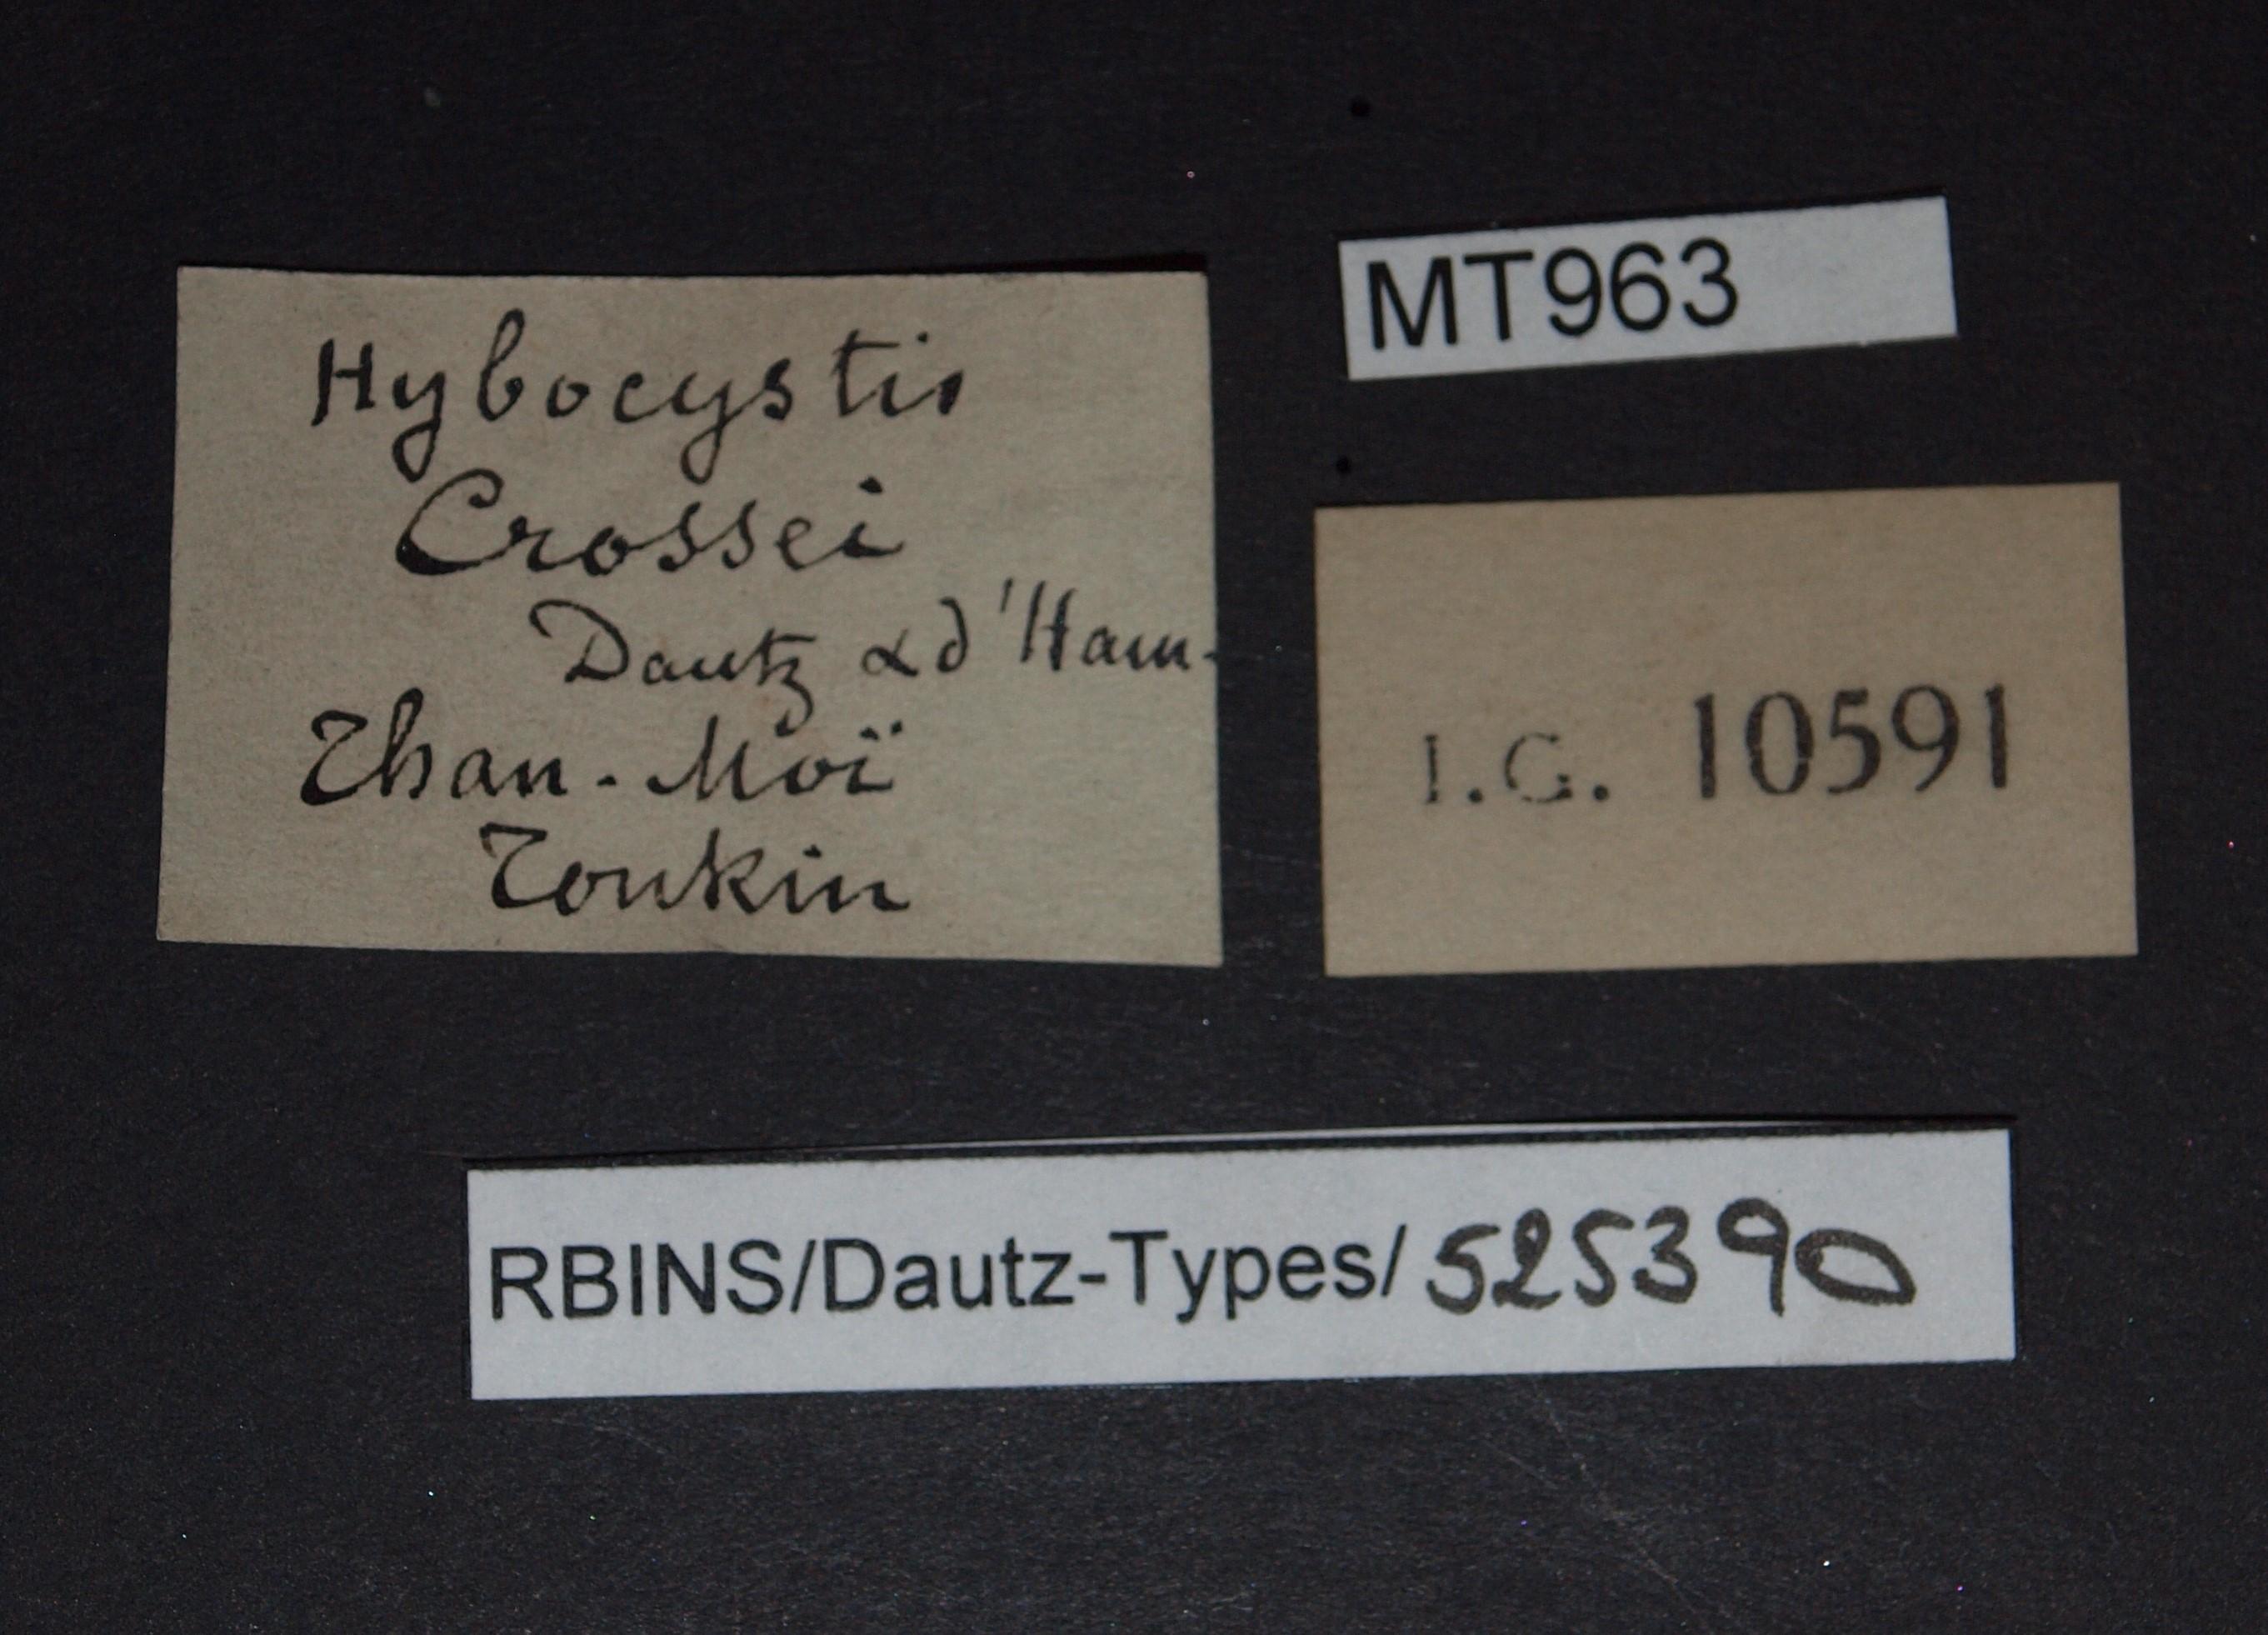 BE-RBINS-INV MT 963 Hybocystis crossei pt Lb.jpg